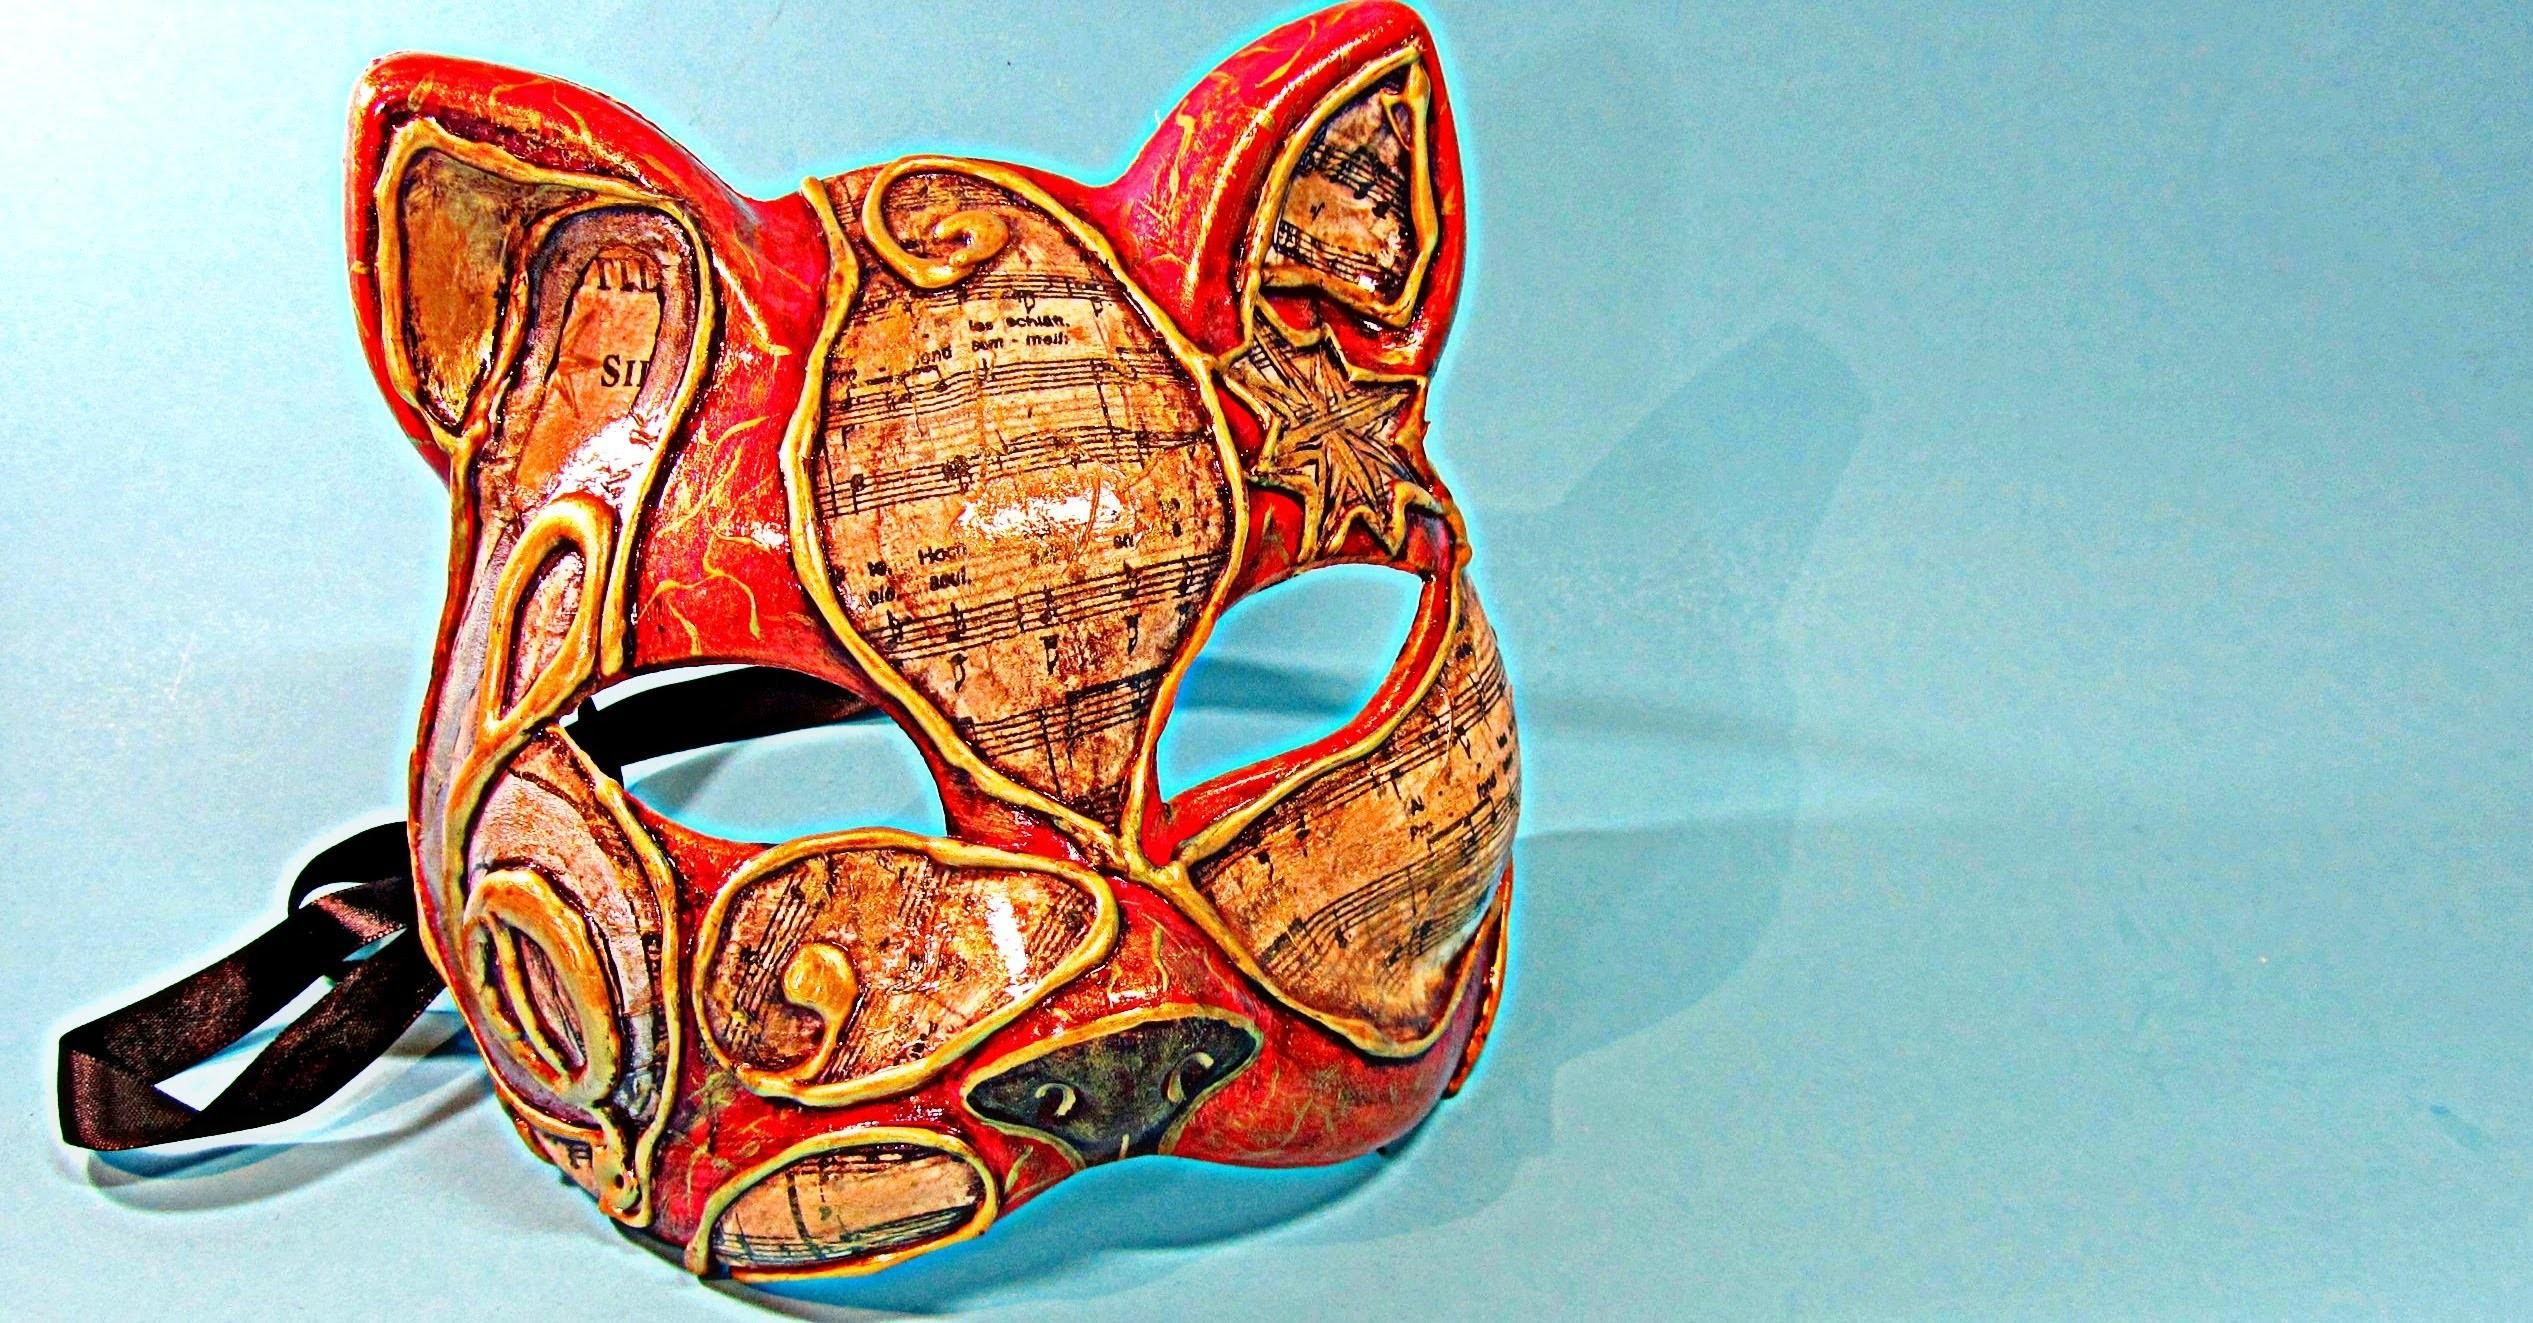 Máscara veneciana. Venetian mask.